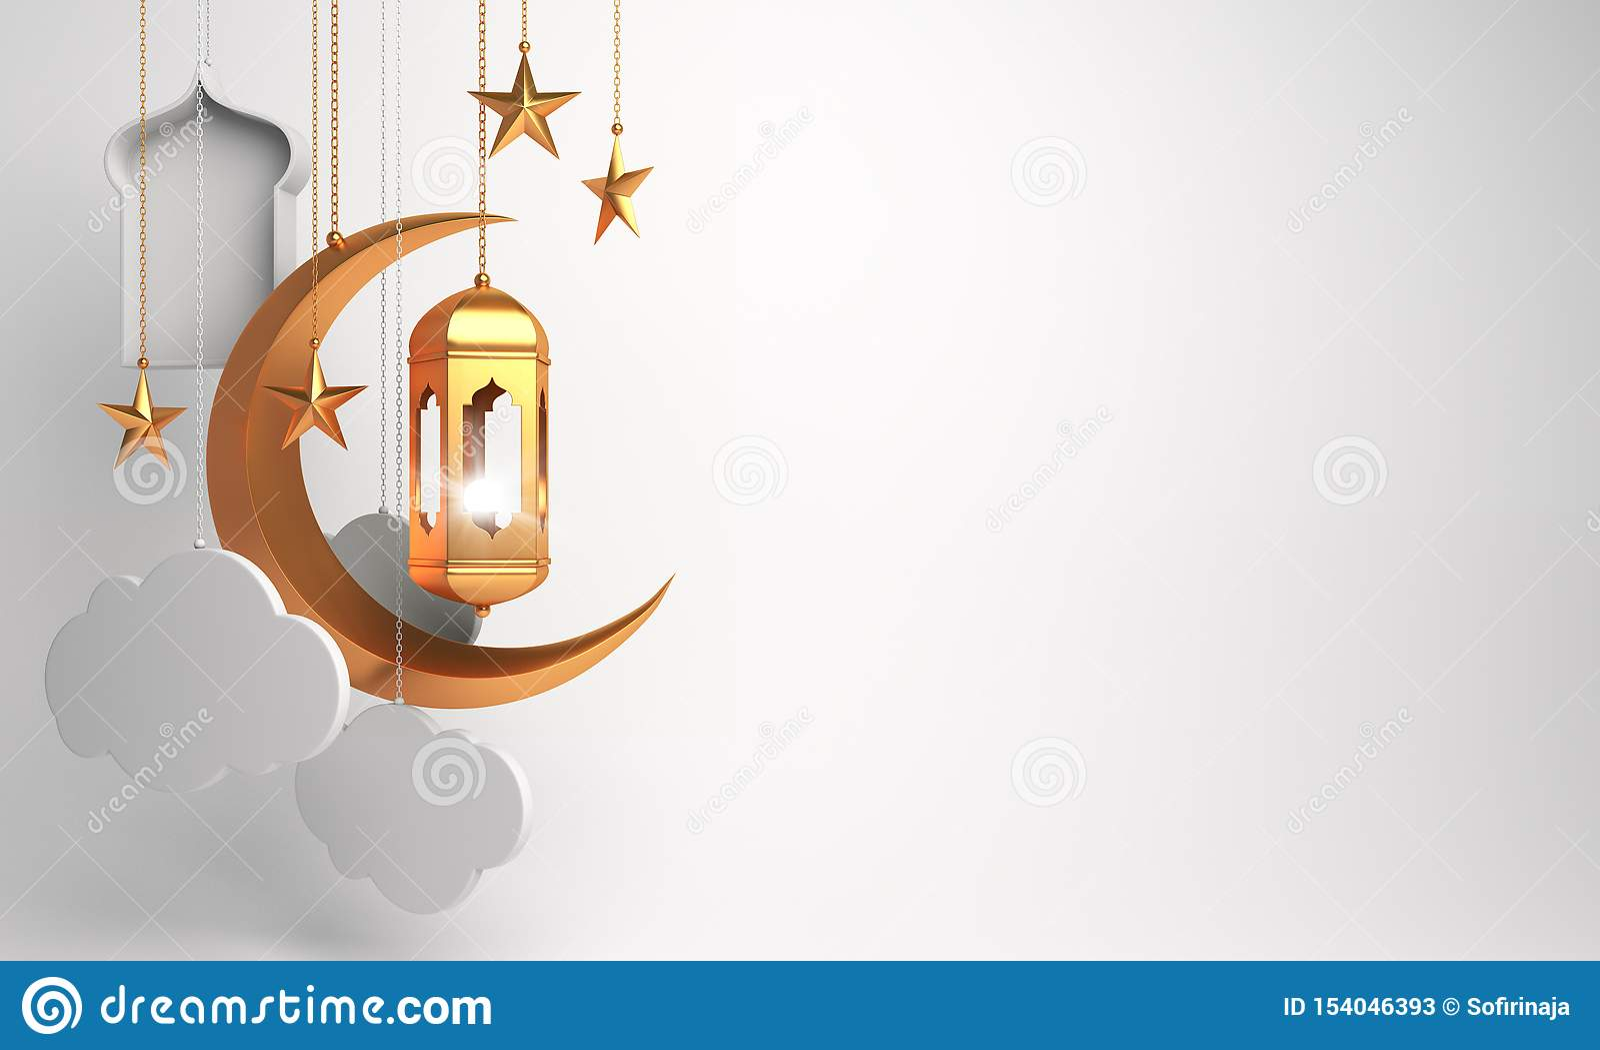 Gold Arabic Lantern, Crescent, Cloud, Star, Window On White ... on jerusalem window, jesus window, valentines day window, thank you window, fashion window, new year window,